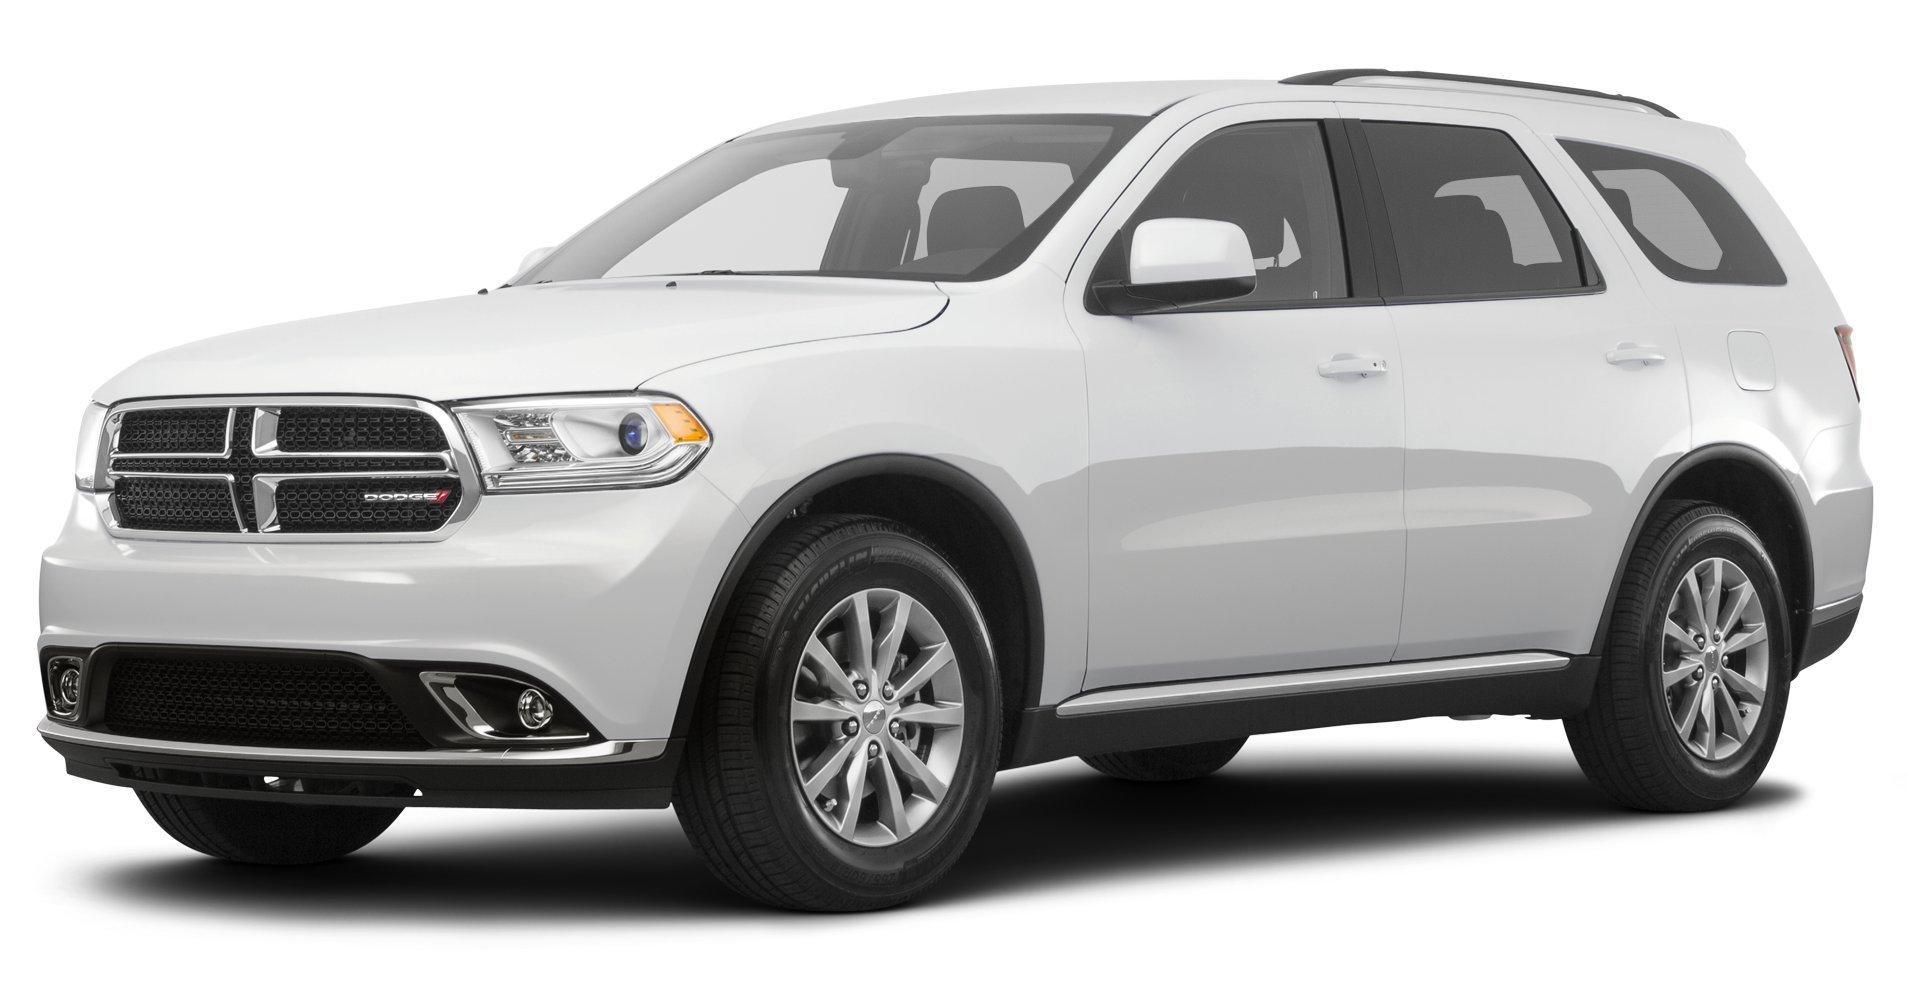 ... 2017 Dodge Durango SXT, Rear Wheel Drive. 2017 Jeep Grand Cherokee ...